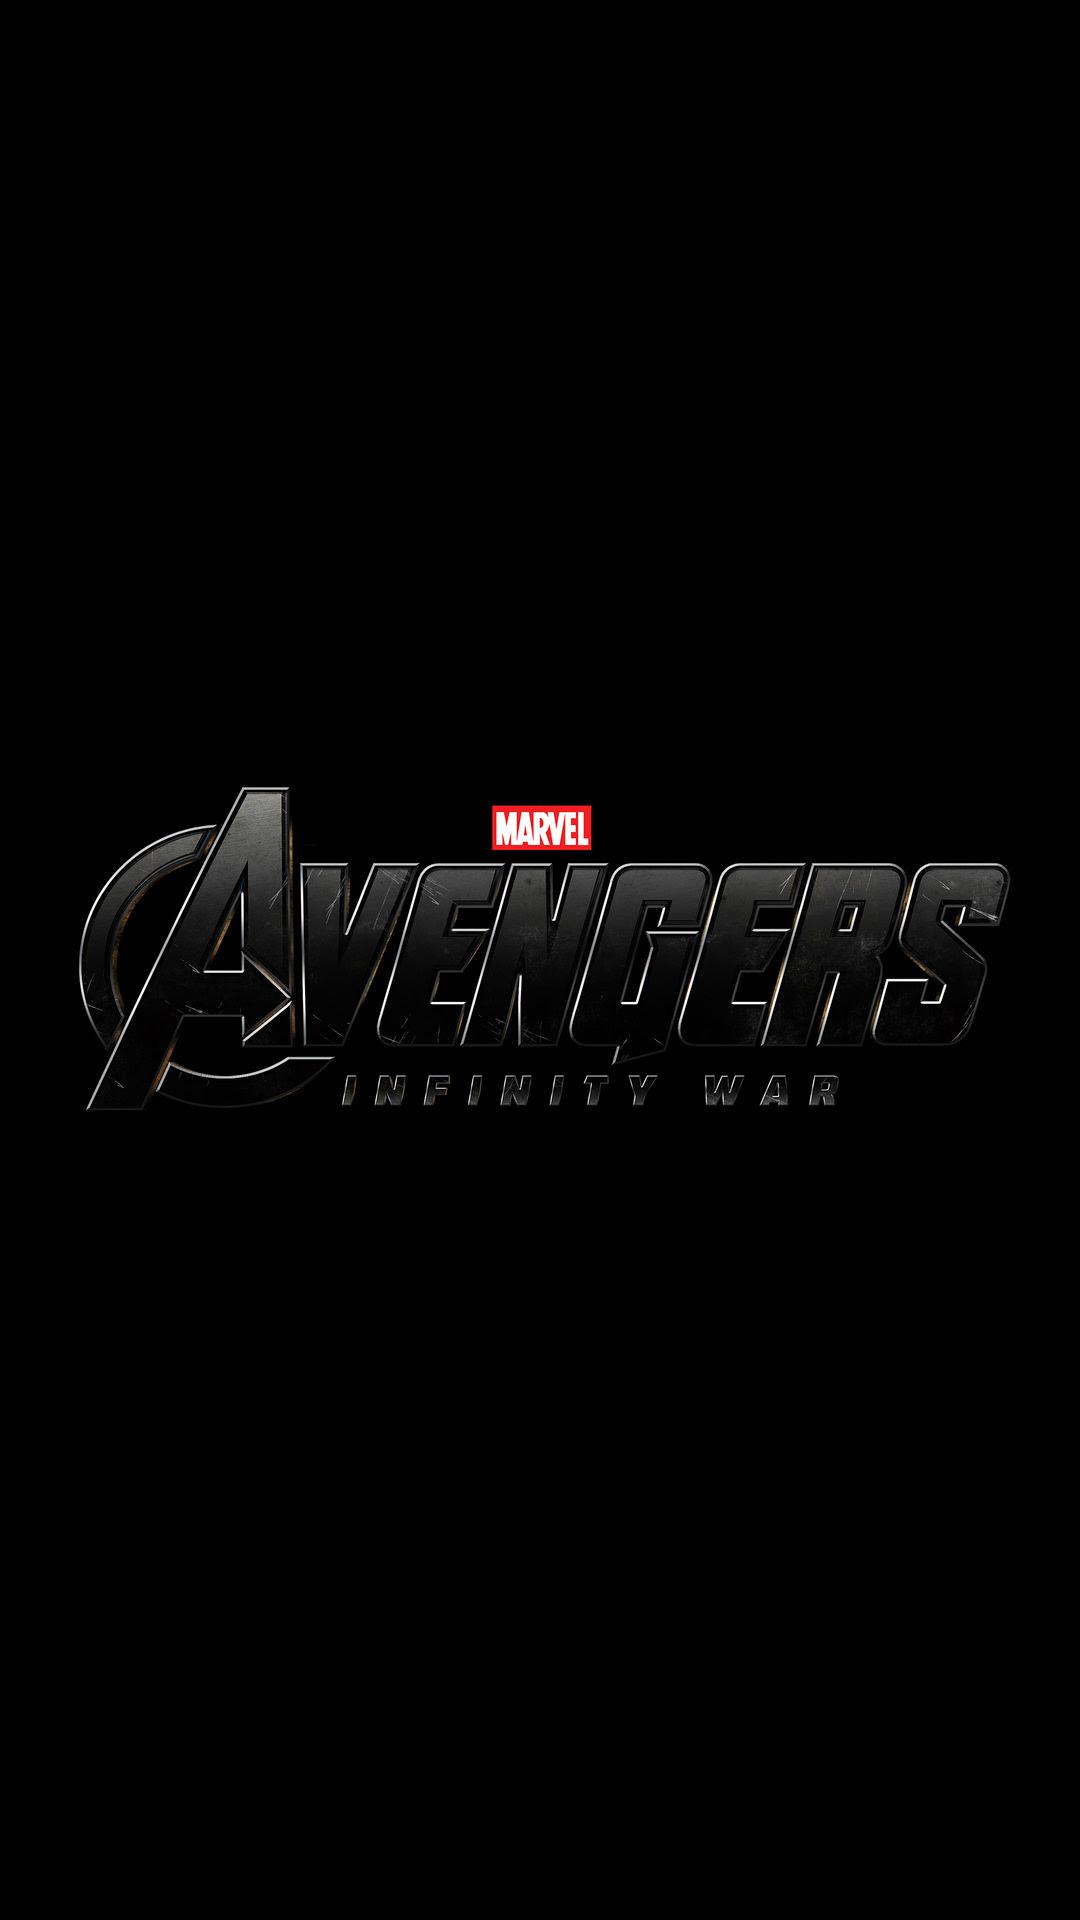 Avengers Infinity War Logo Download 4k Wallpapers